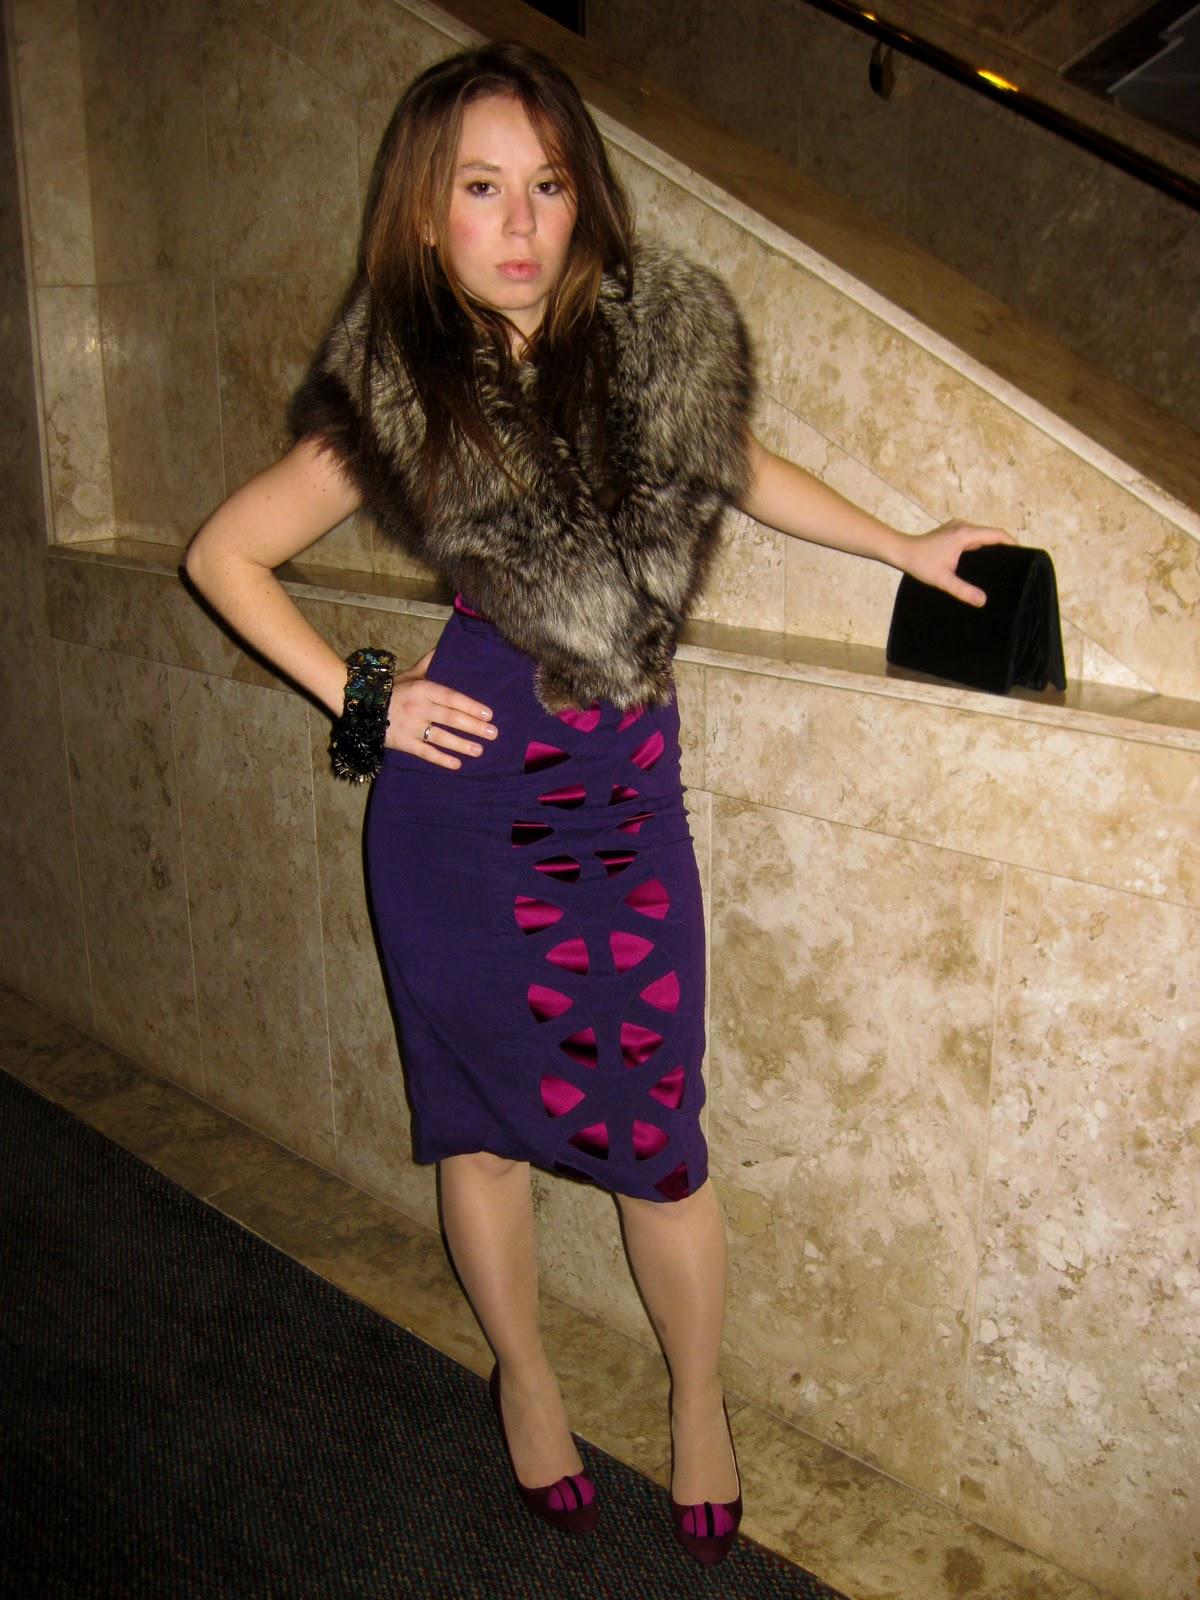 http://4.bp.blogspot.com/_mKn3MI5-_gA/TMhutRZUVRI/AAAAAAAACds/Hf6GD1-tRZQ/s1600/purpleRain.jpg